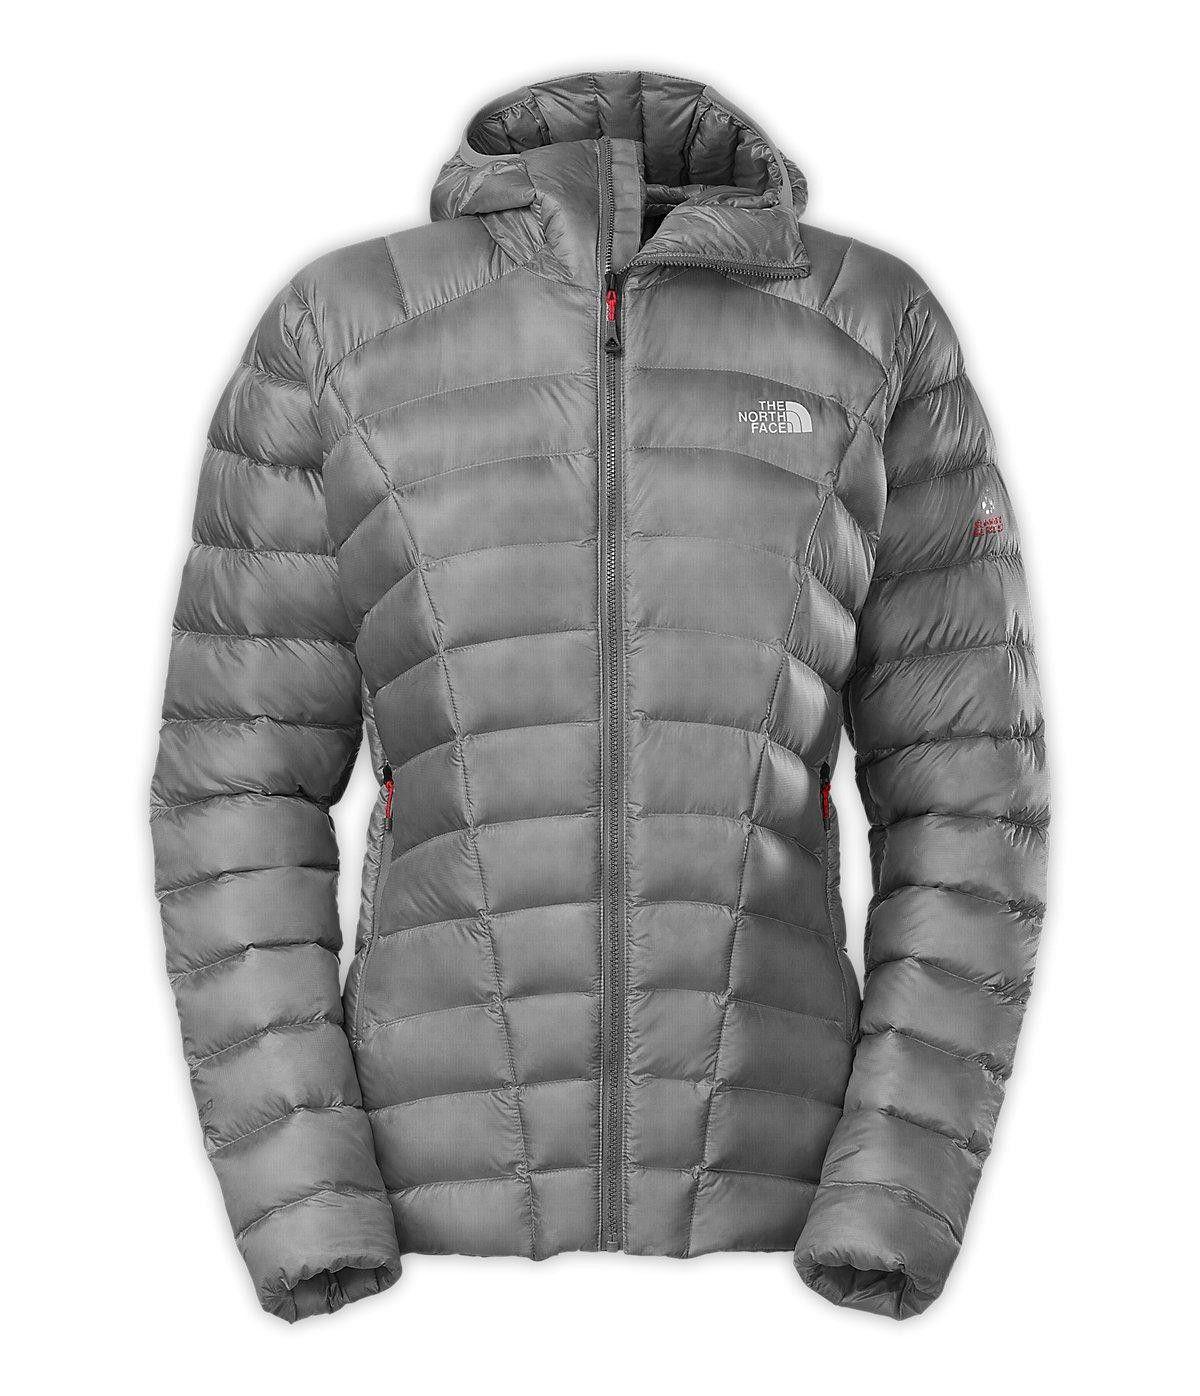 North face summit series womens jacket